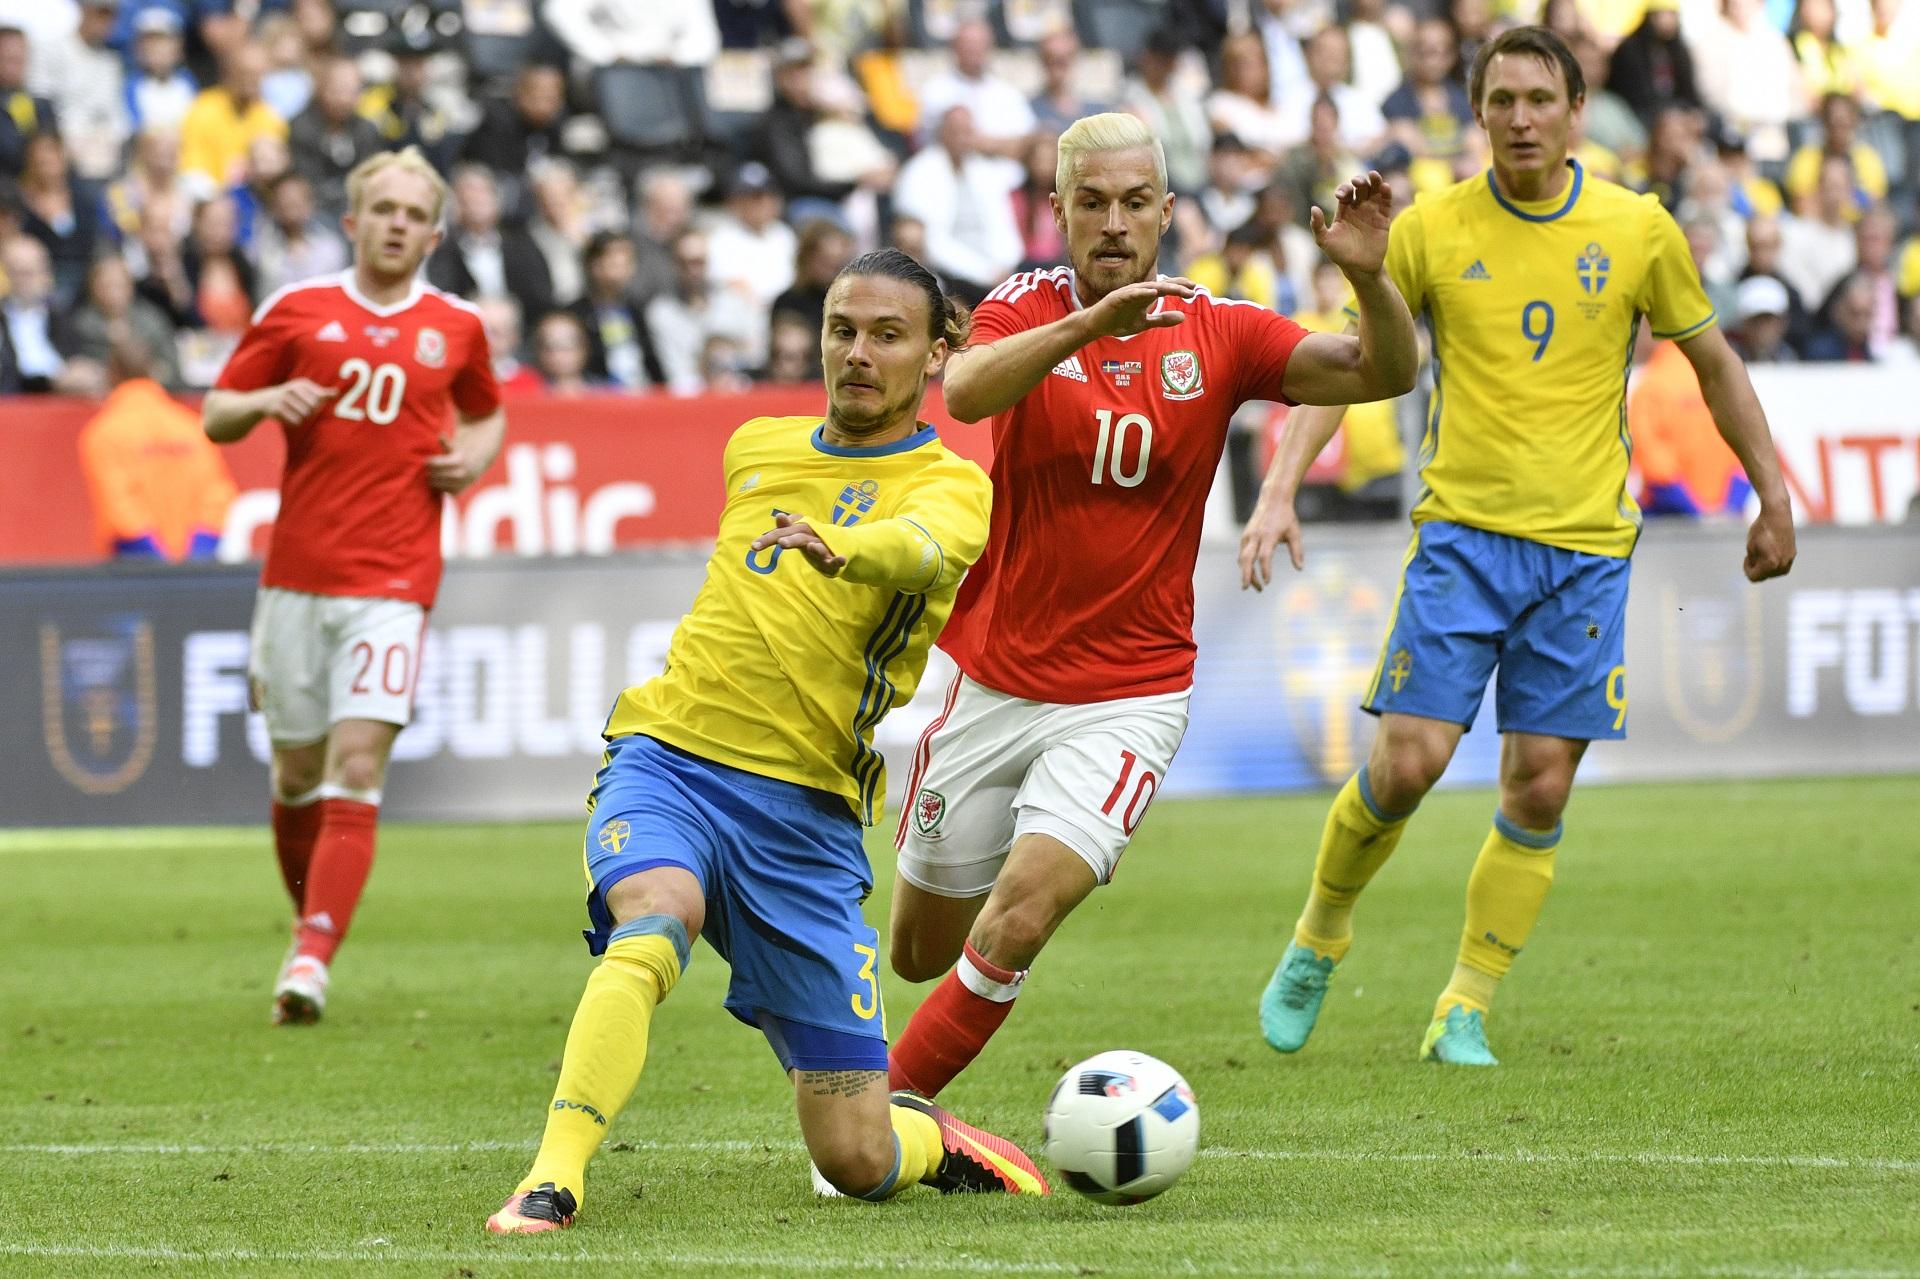 Россия аргентина мини футбол финал прогноз уфа